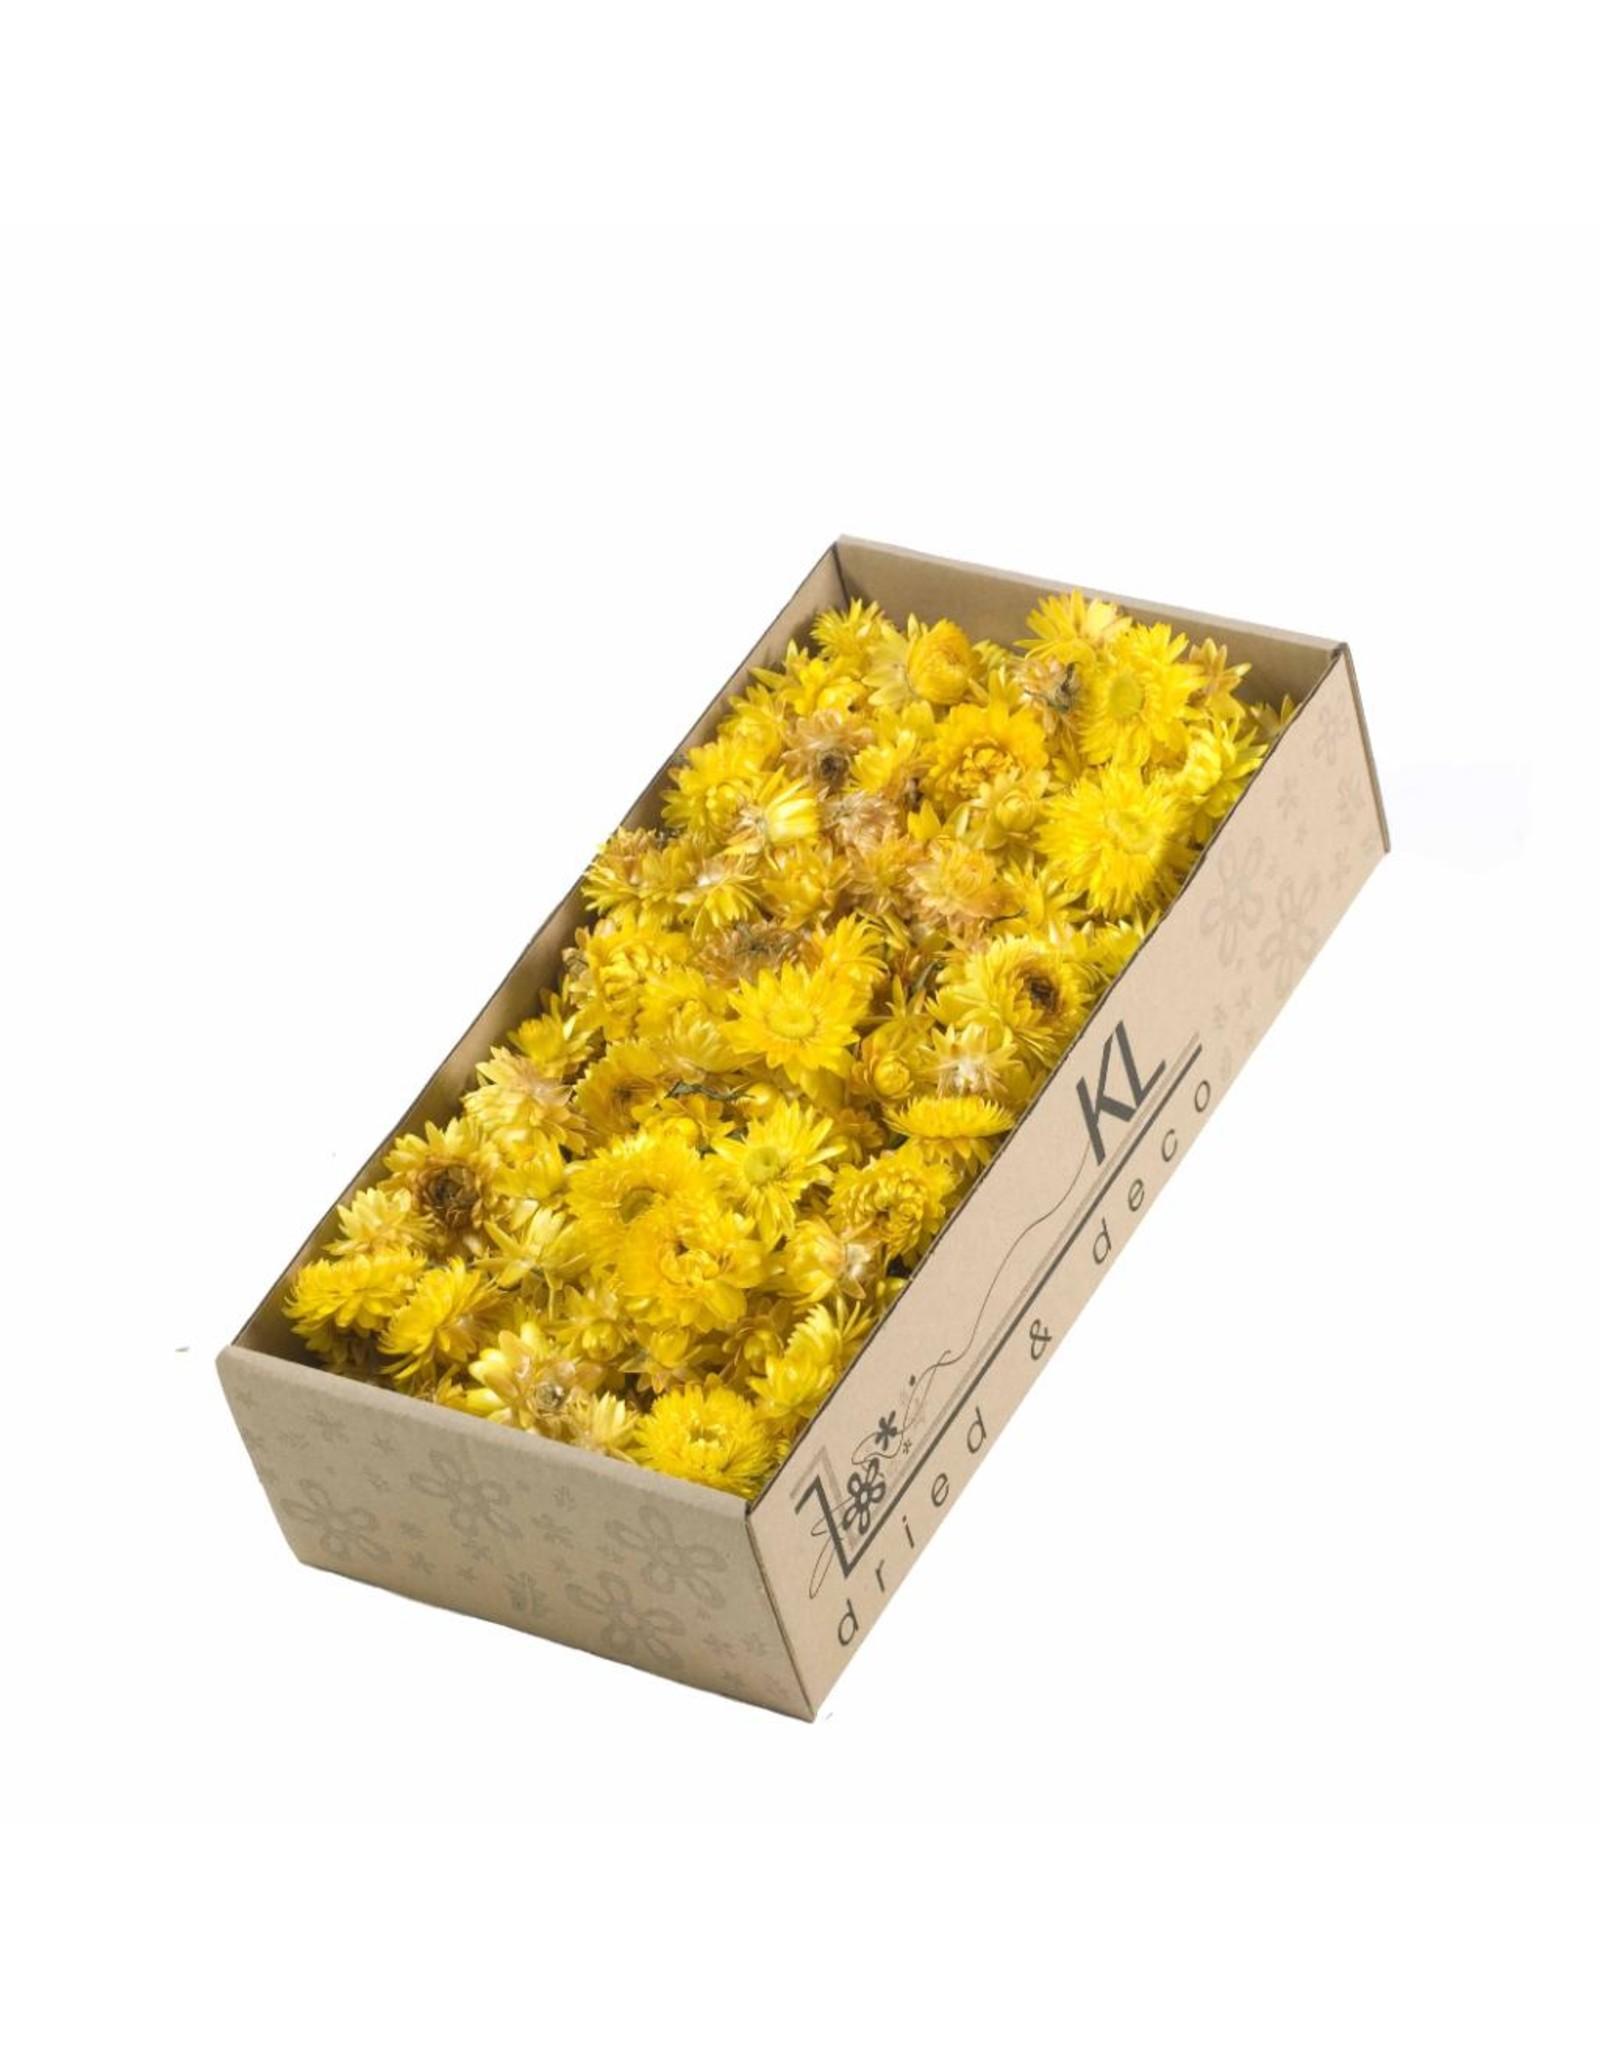 Helichrysum heads 100gr SB natural yellow x 6